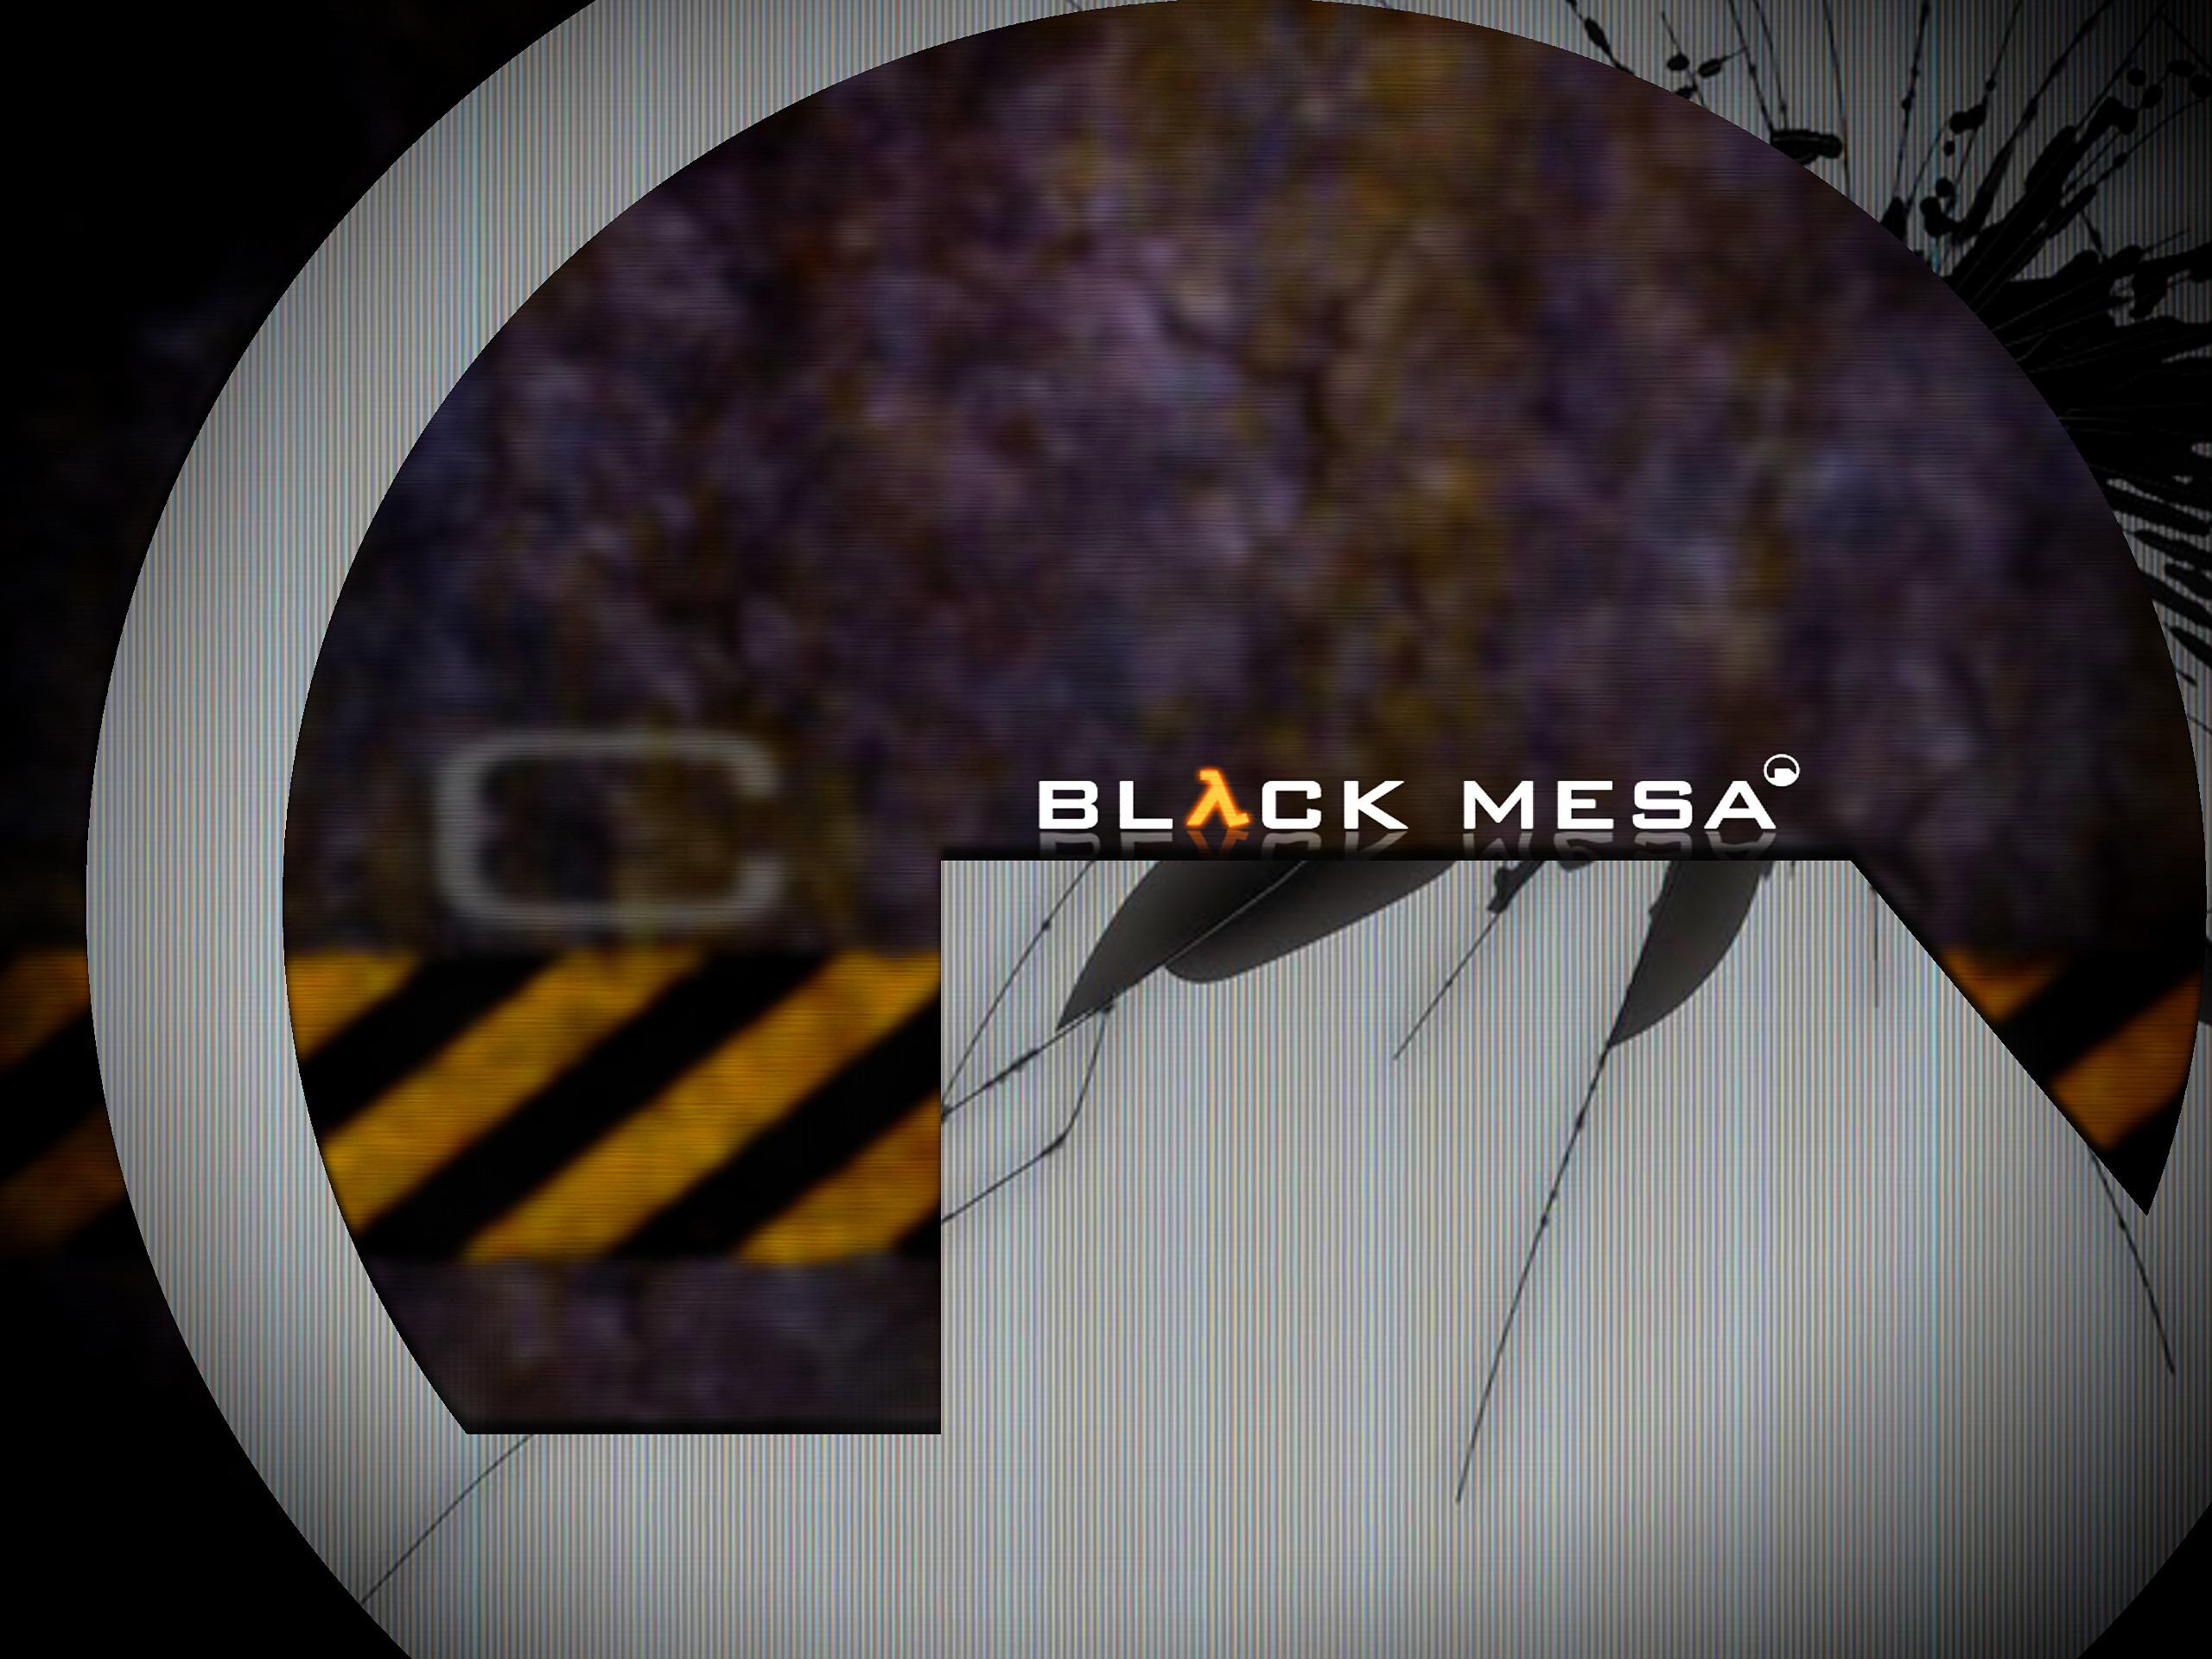 … Black Mesa Source C6 Wallpaper by Binary-Map